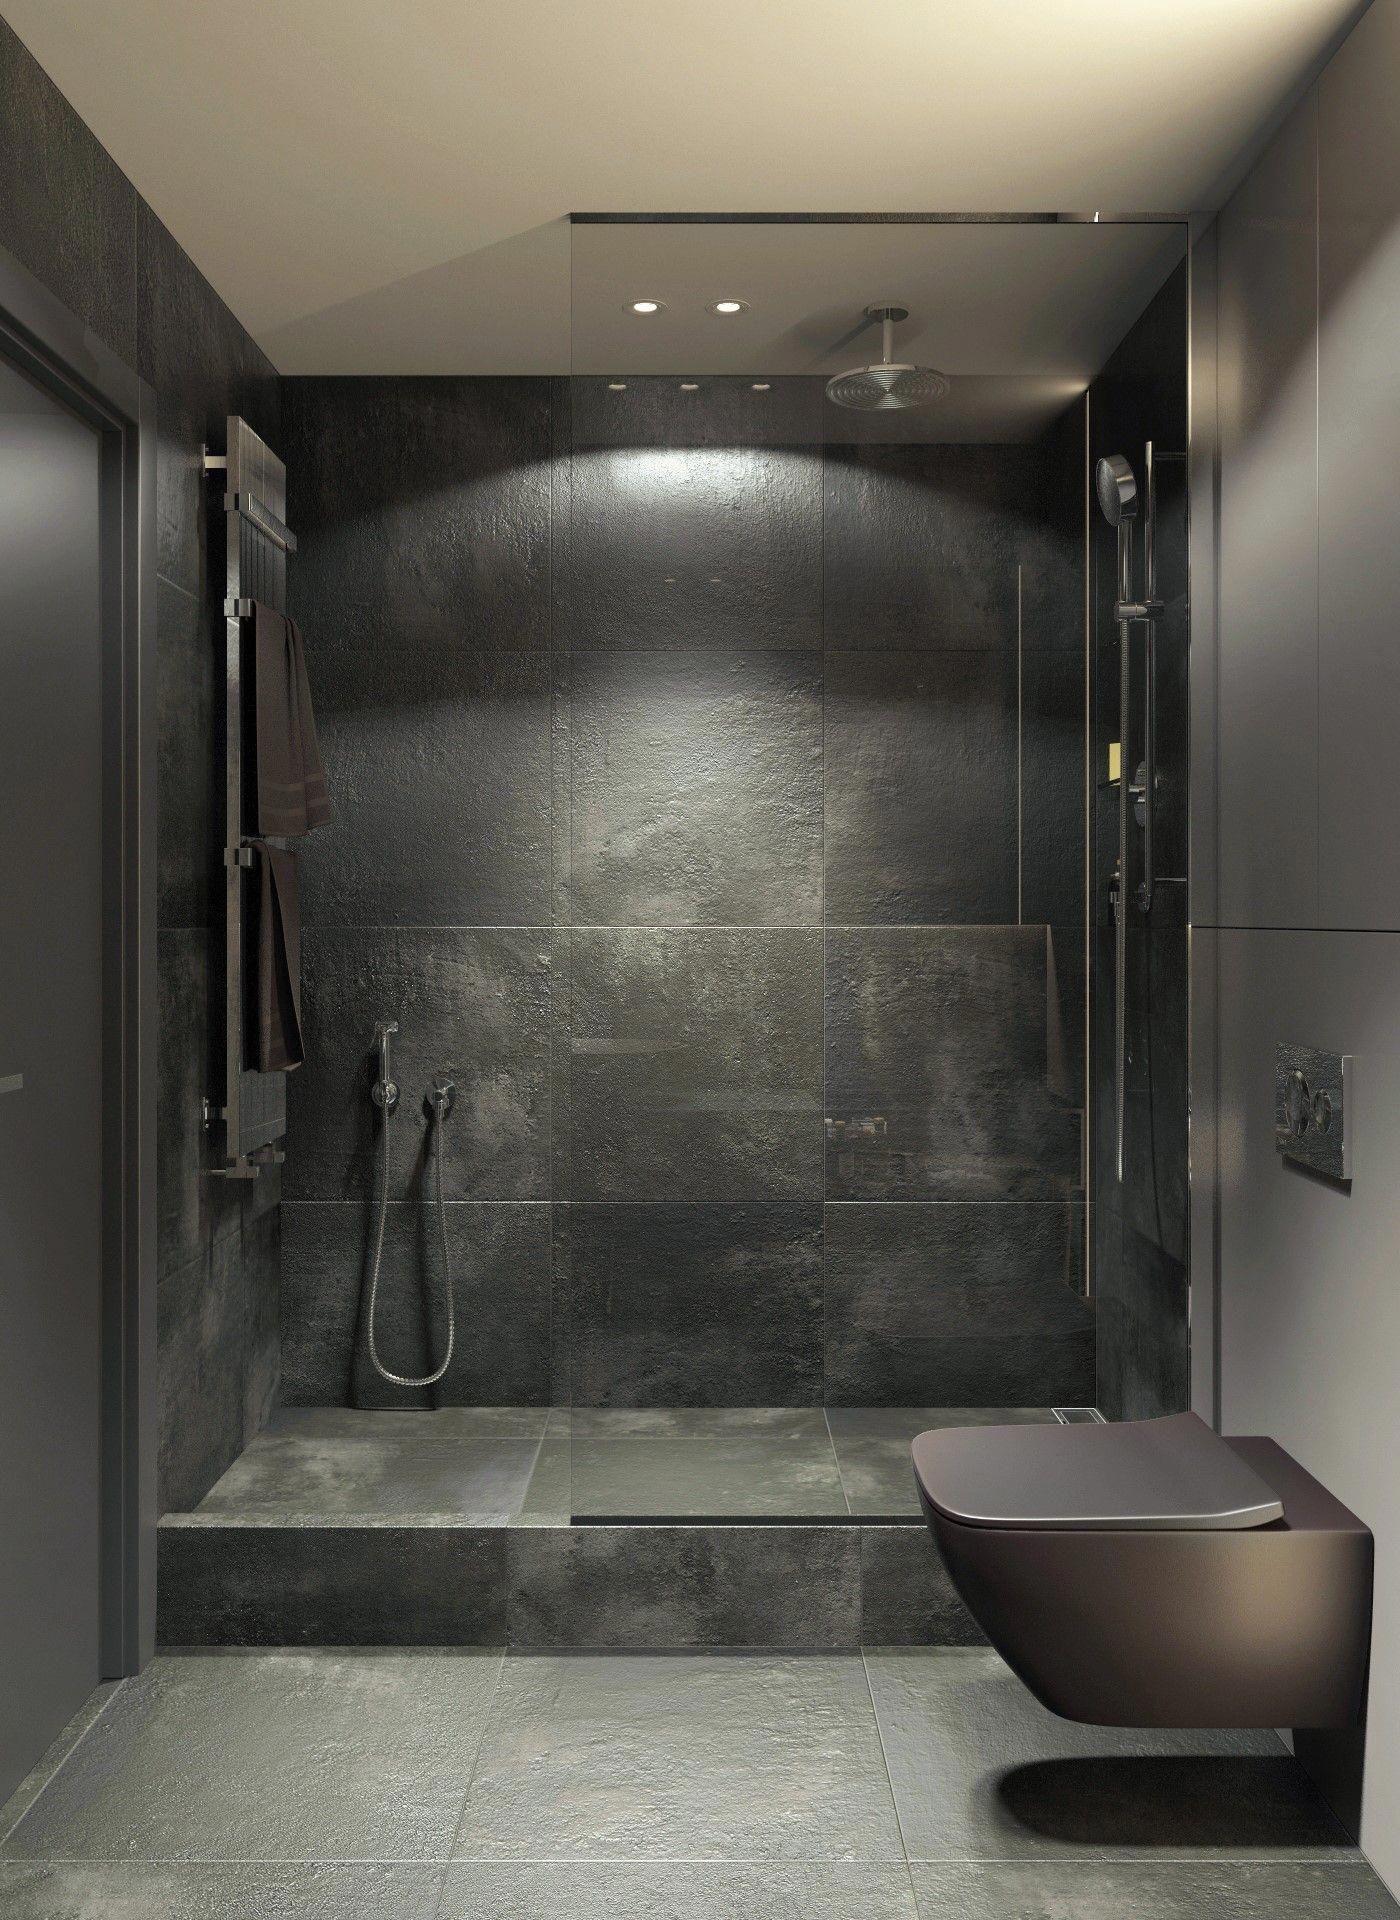 Pin By Thai đặng On Designer Bathroom Accessories Bathroom Design Inspiration Bathroom Vanity Designs Modern Bathroom